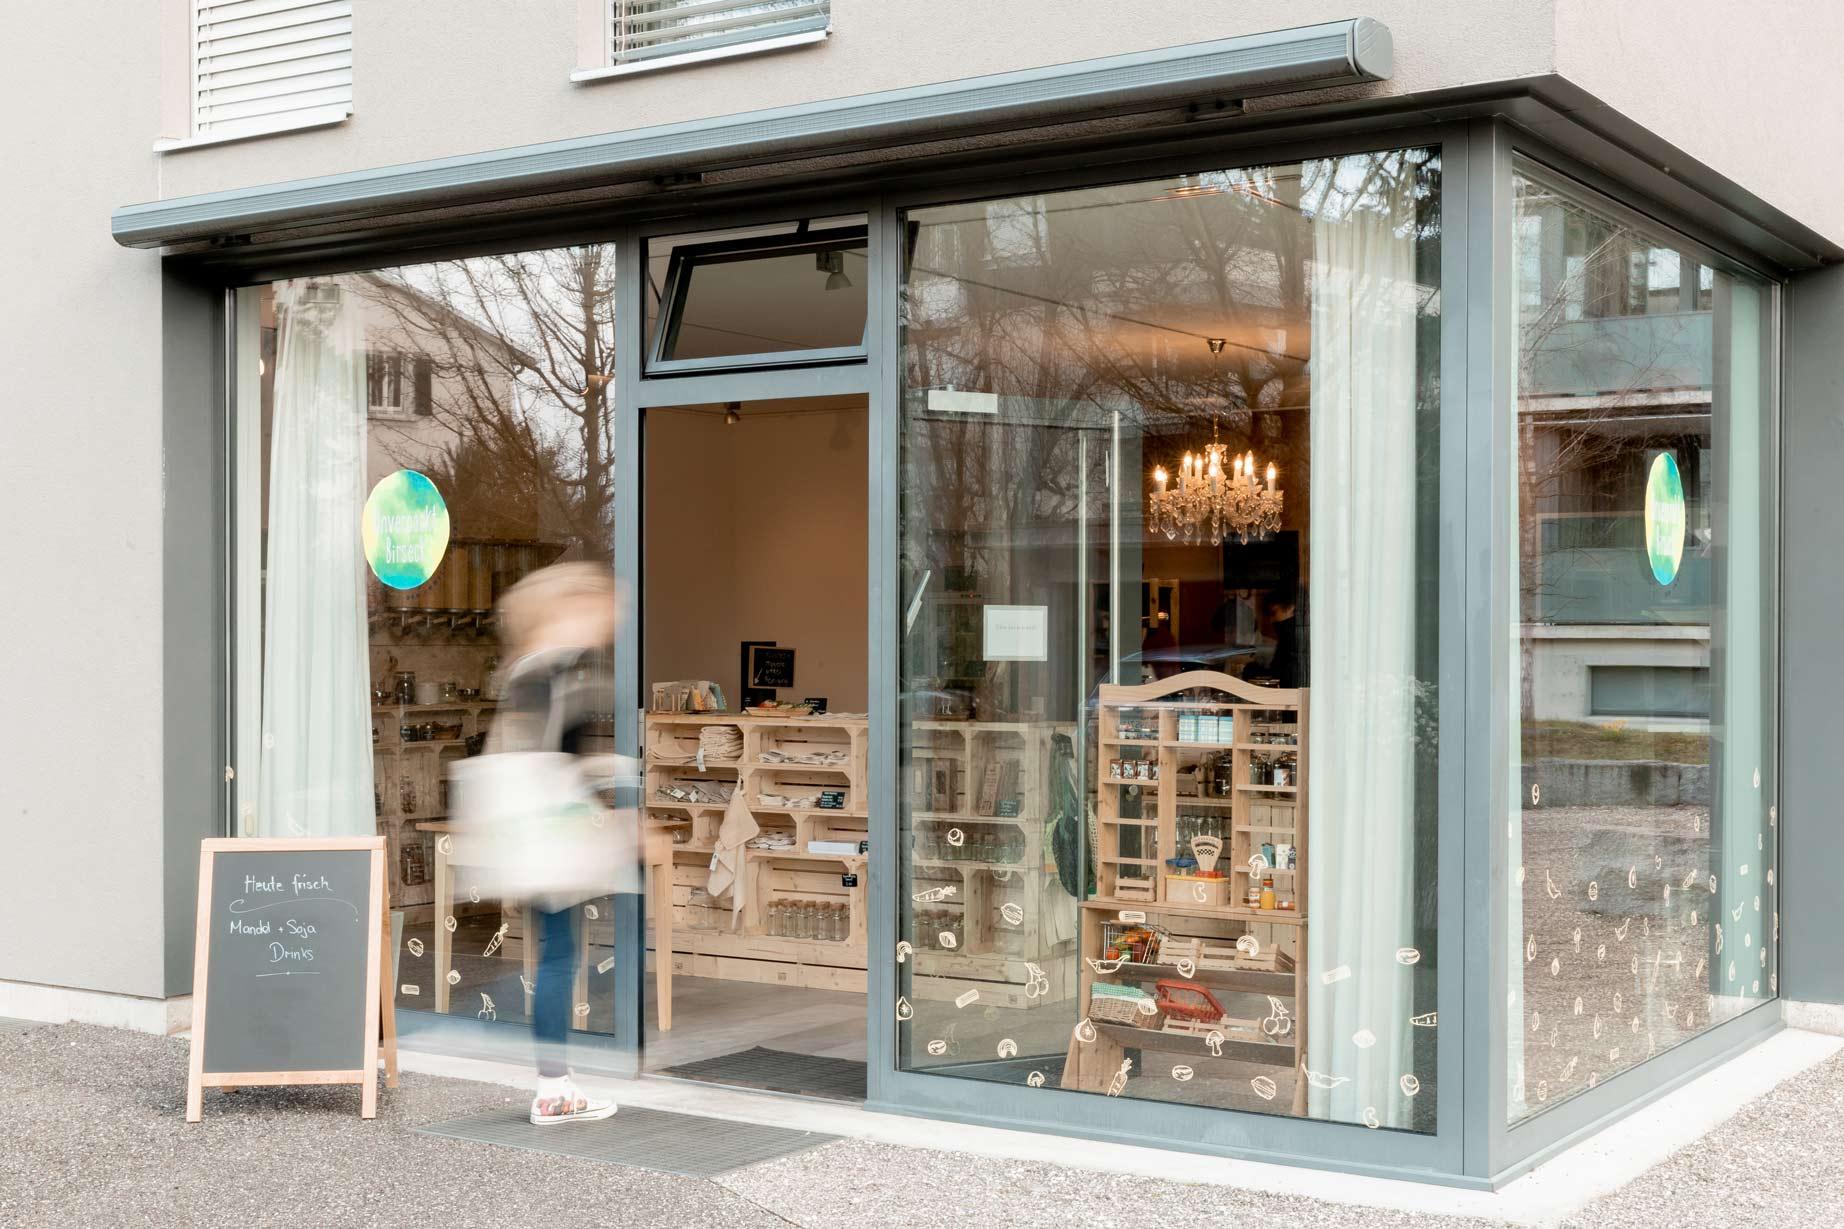 Unverpackt Birseck | Gemeinsam gegen den Verpackungswahn, der Unverpackt-Laden in Arlesheim